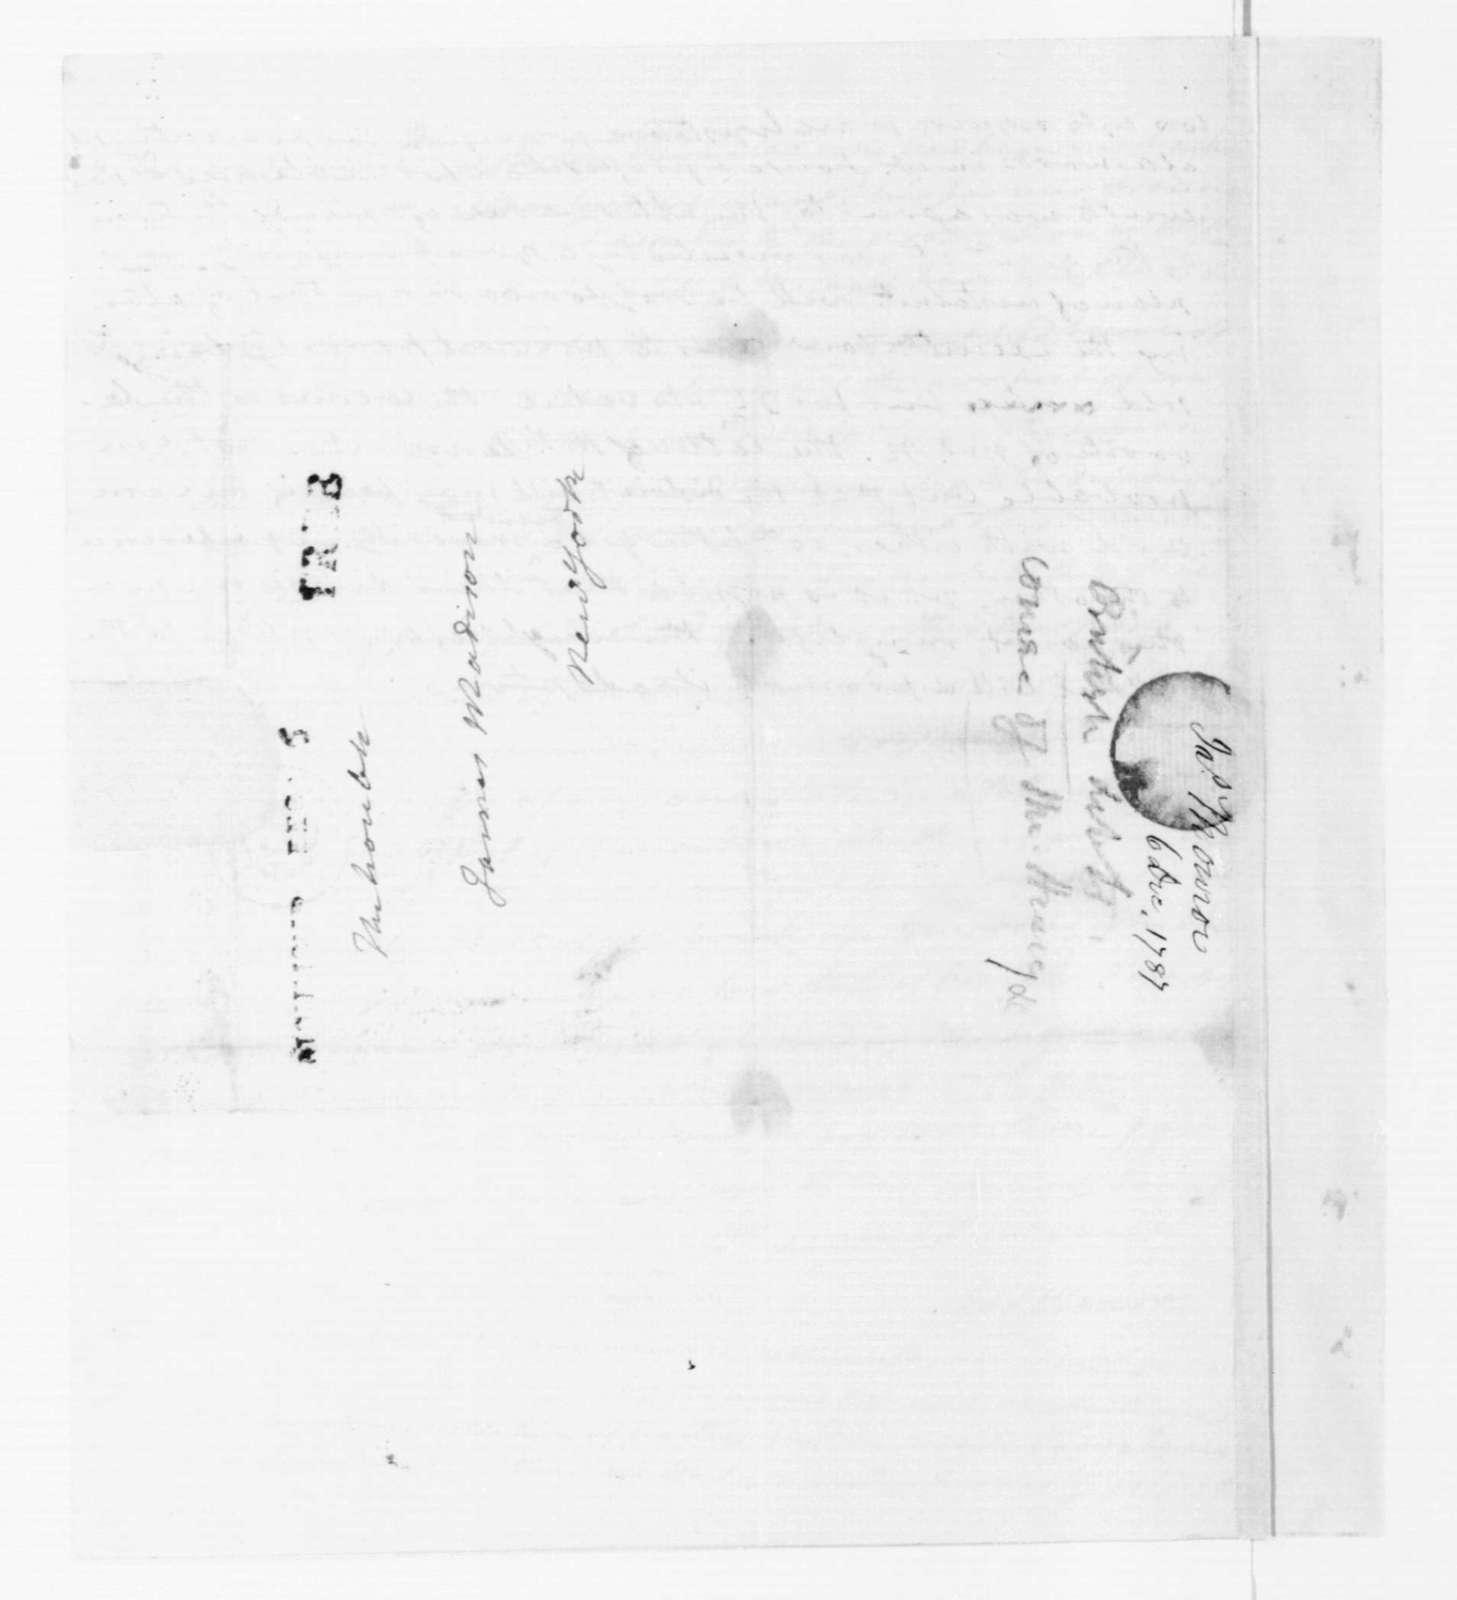 James Monroe to James Madison, December 6, 1787.